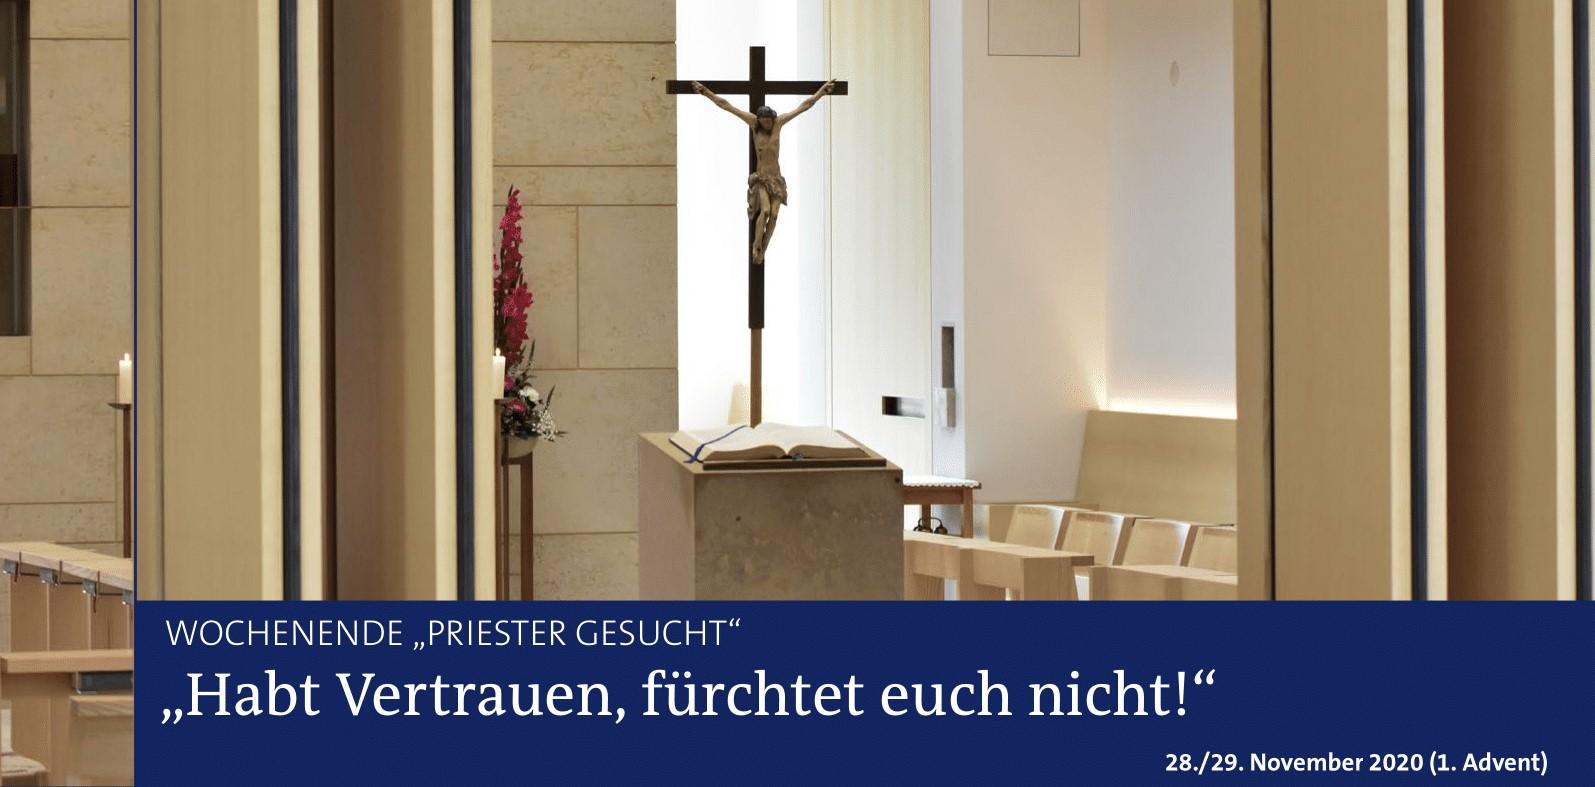 Priester gesucht am 1. Advent